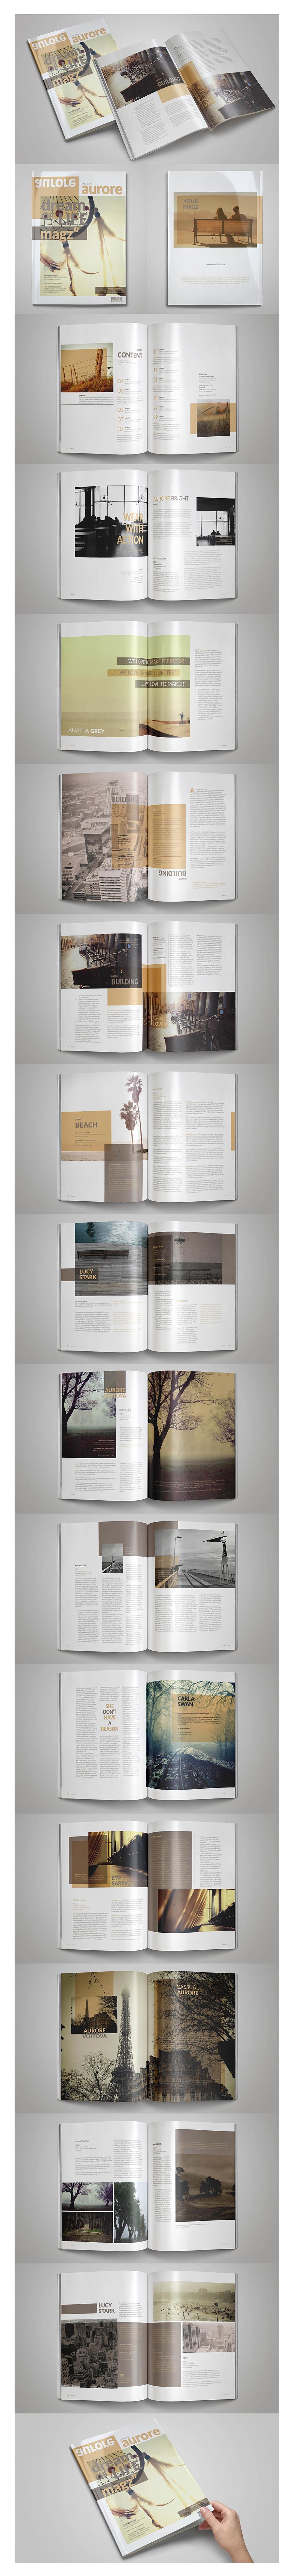 Plantilla Revista Multipropuesta Indesign - 1001.graphics